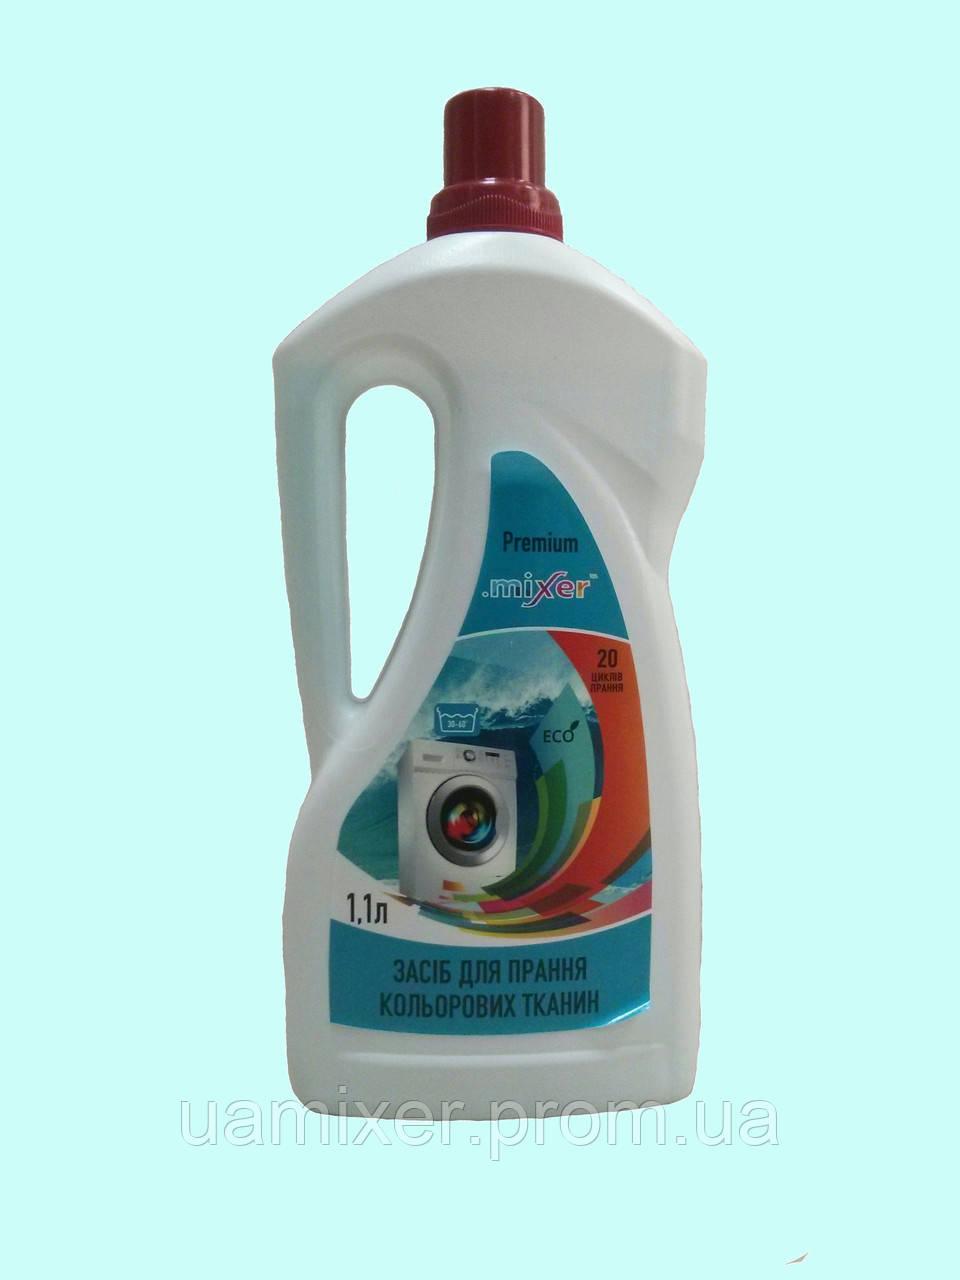 "Засіб для прання кольорових тканин ""MIXER"" Premium, 1.1л - МИКСЕР.ЮА Интернет-магазин в Харькове"